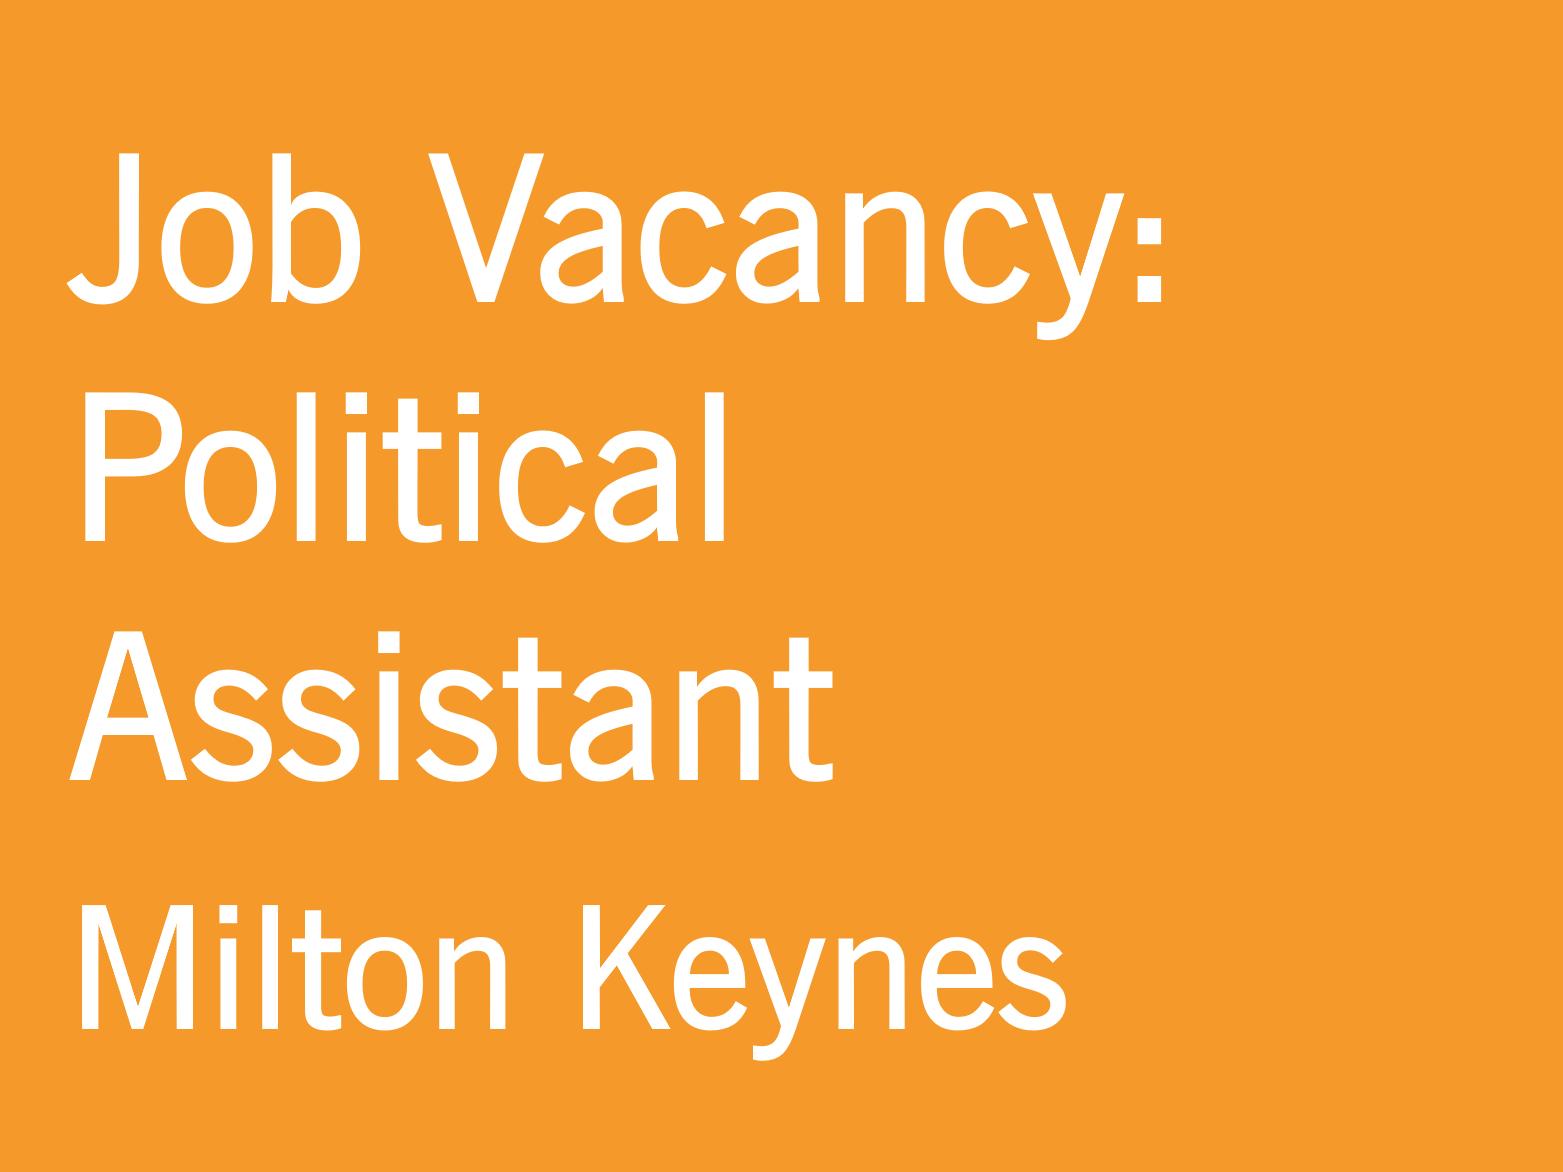 Job Vacancy: Political Assistant, Milton Keynes